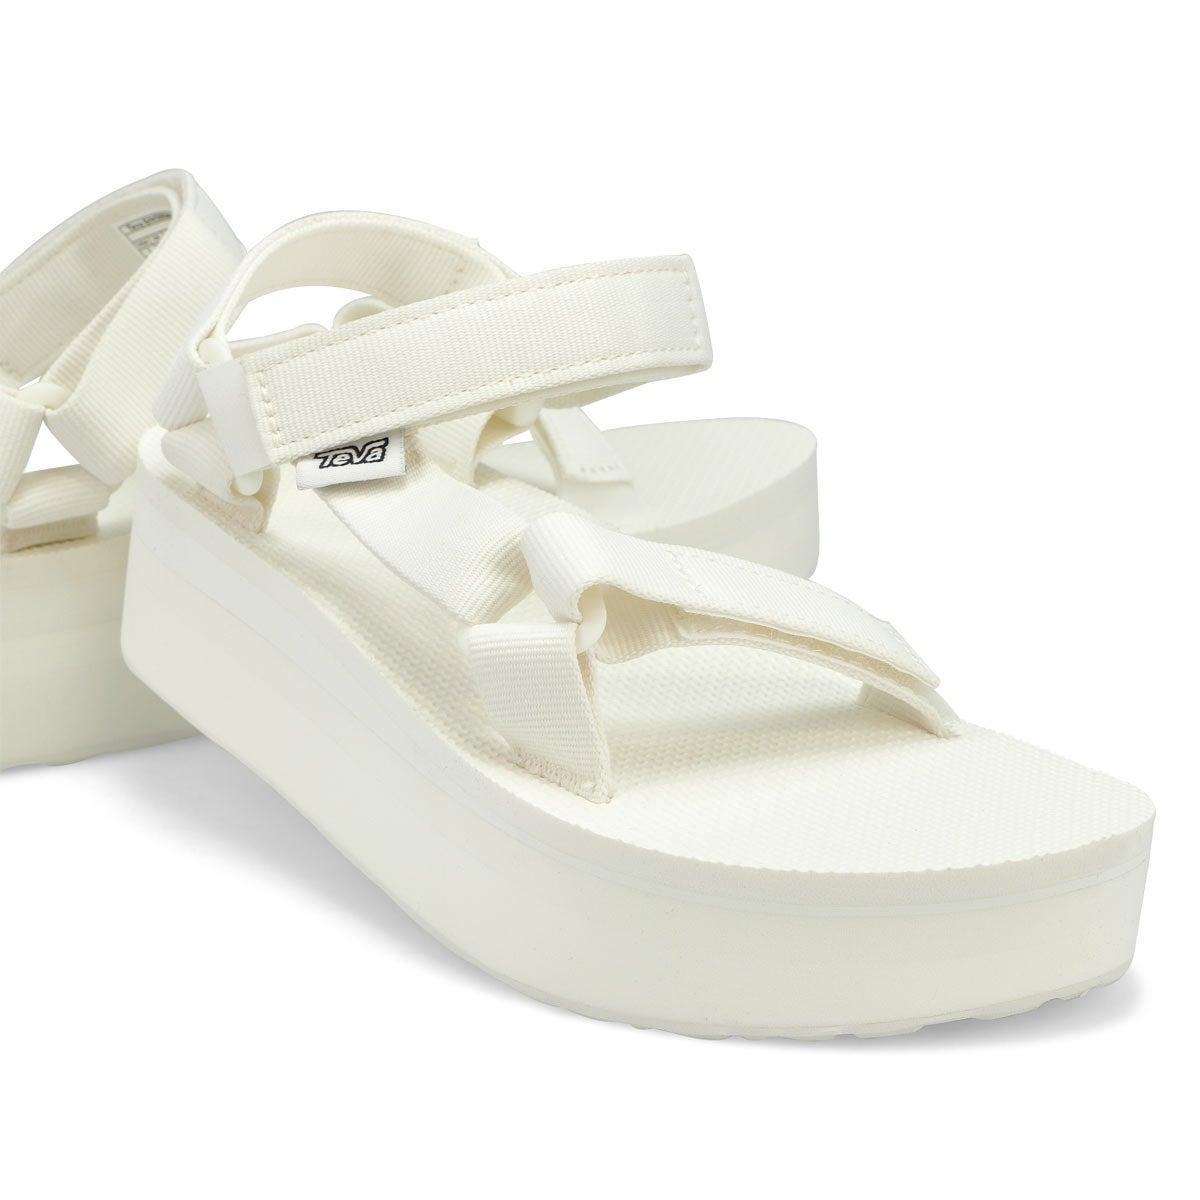 Women's Flatform Universal Sandal - Bright White